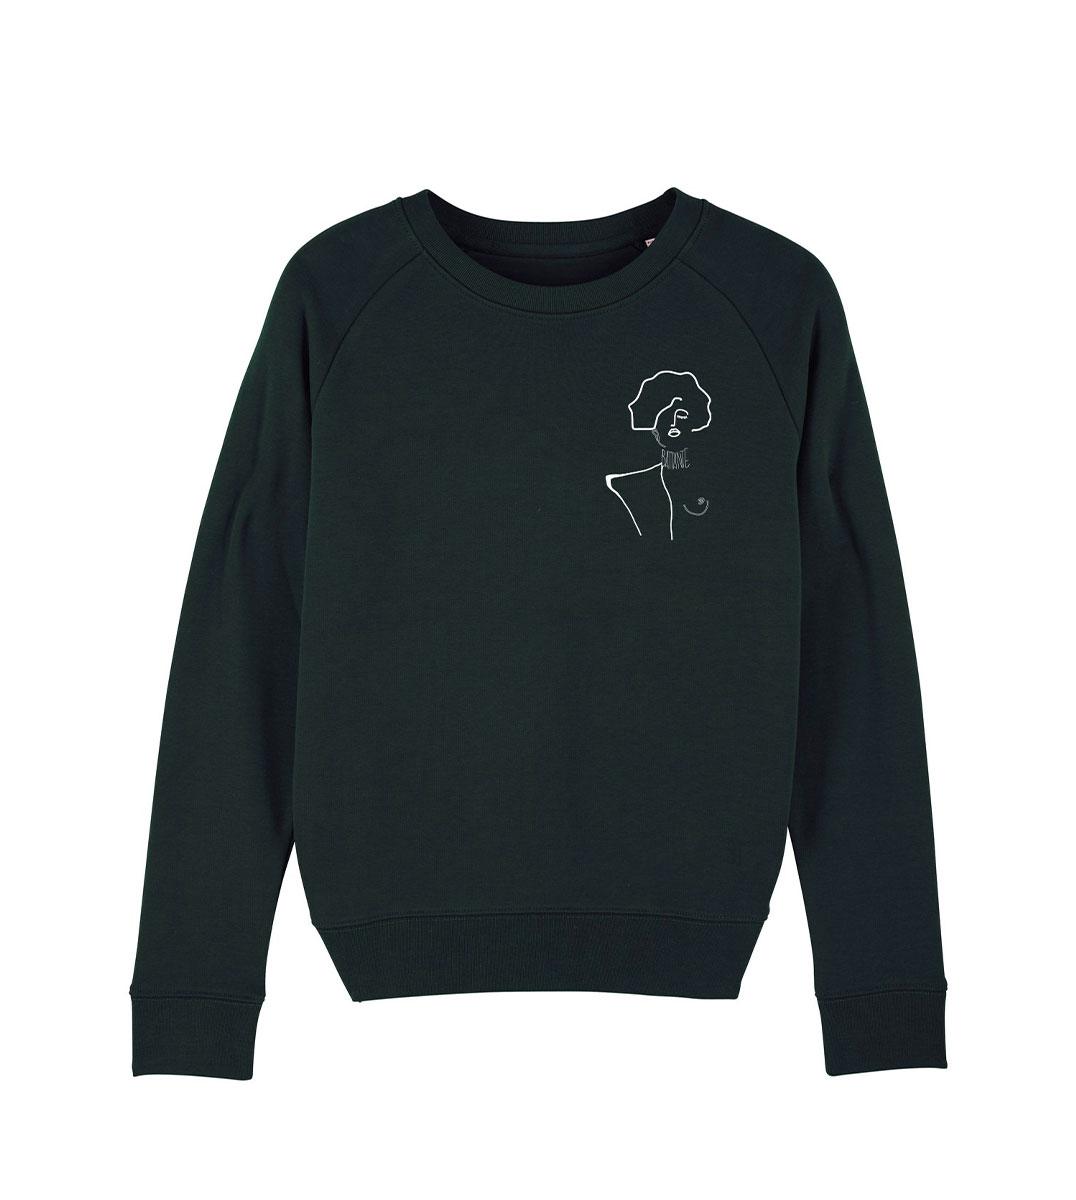 mockup sweatshirt noir klimt de la marque leonor roversi